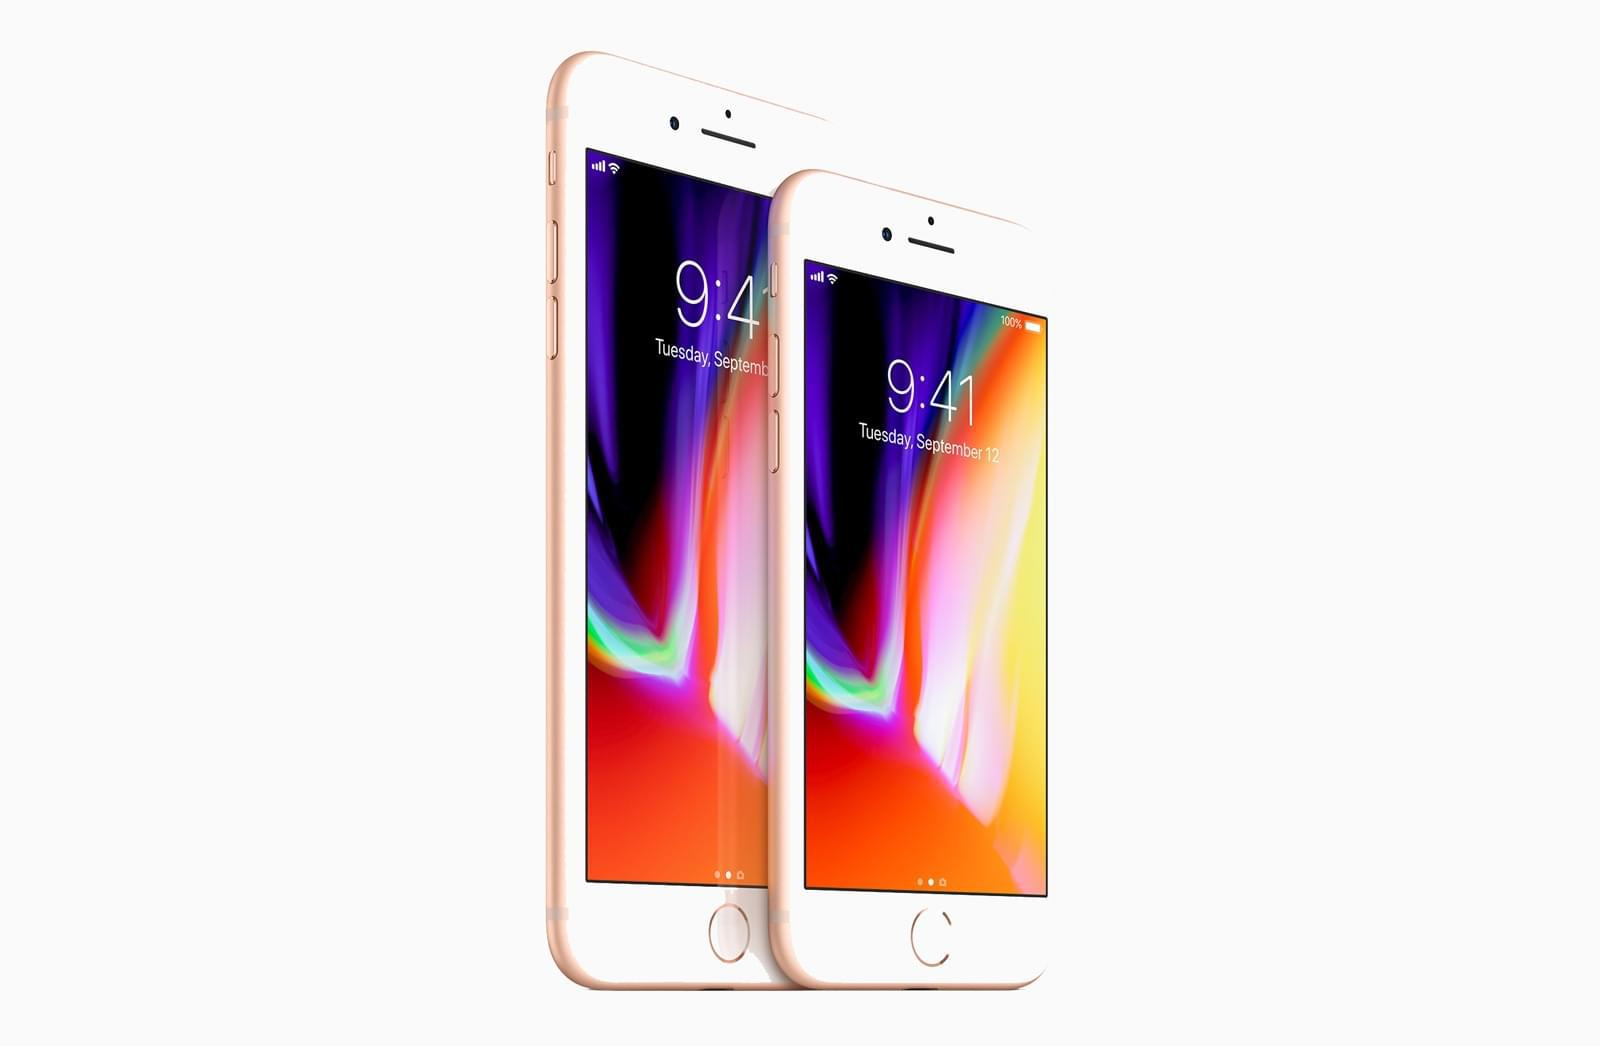 iPhone8外观与7差别不大 最明显改变是用玻璃后壳